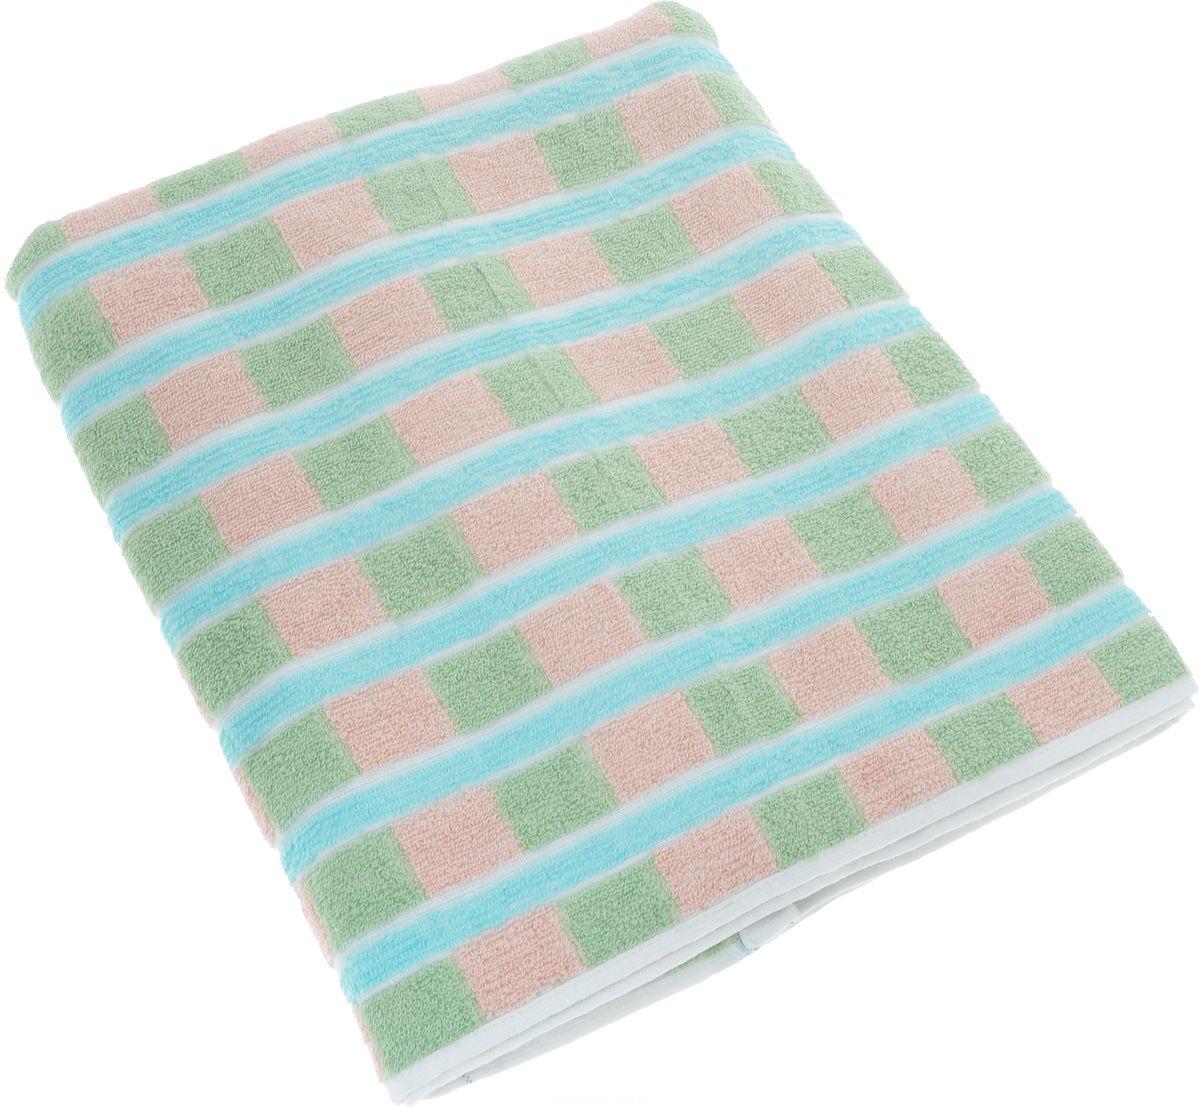 все цены на Полотенца Soavita Полотенце Linda Цвет: Зеленый (70х140 см) в интернете